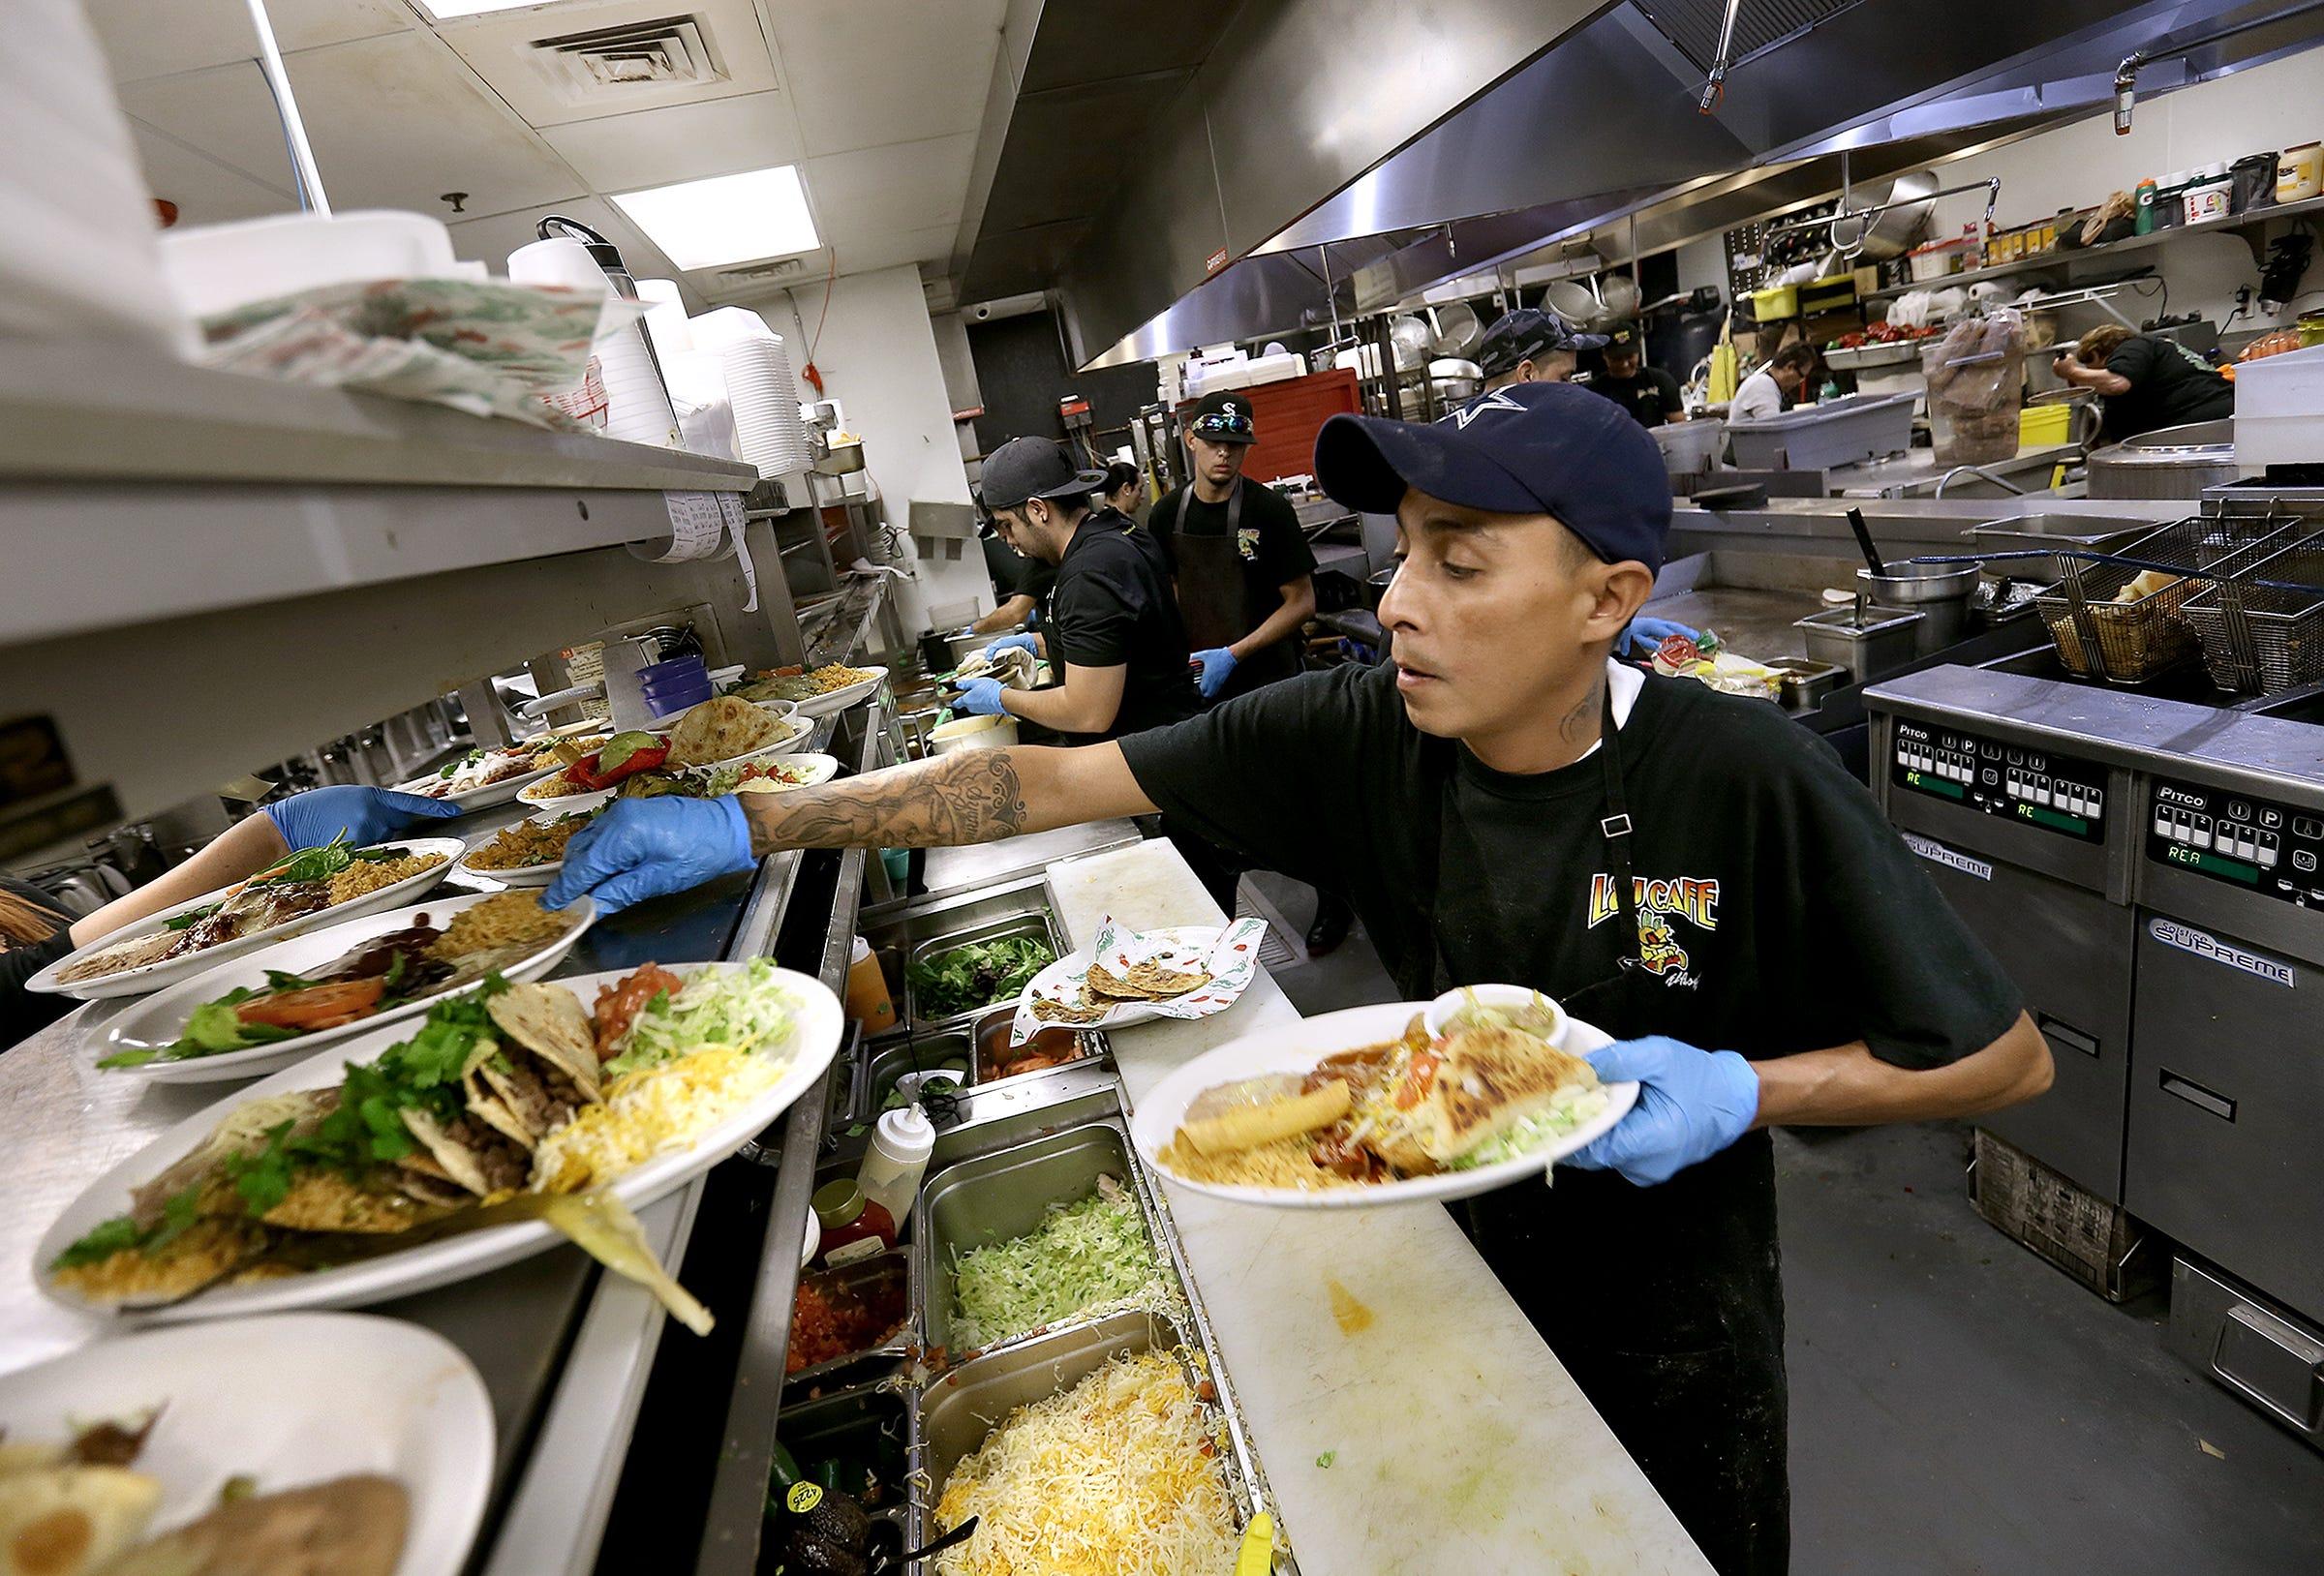 L&J Cafe in El Paso wins USA TODAY's Best Tex-Mex in Texas contest   El Paso Times